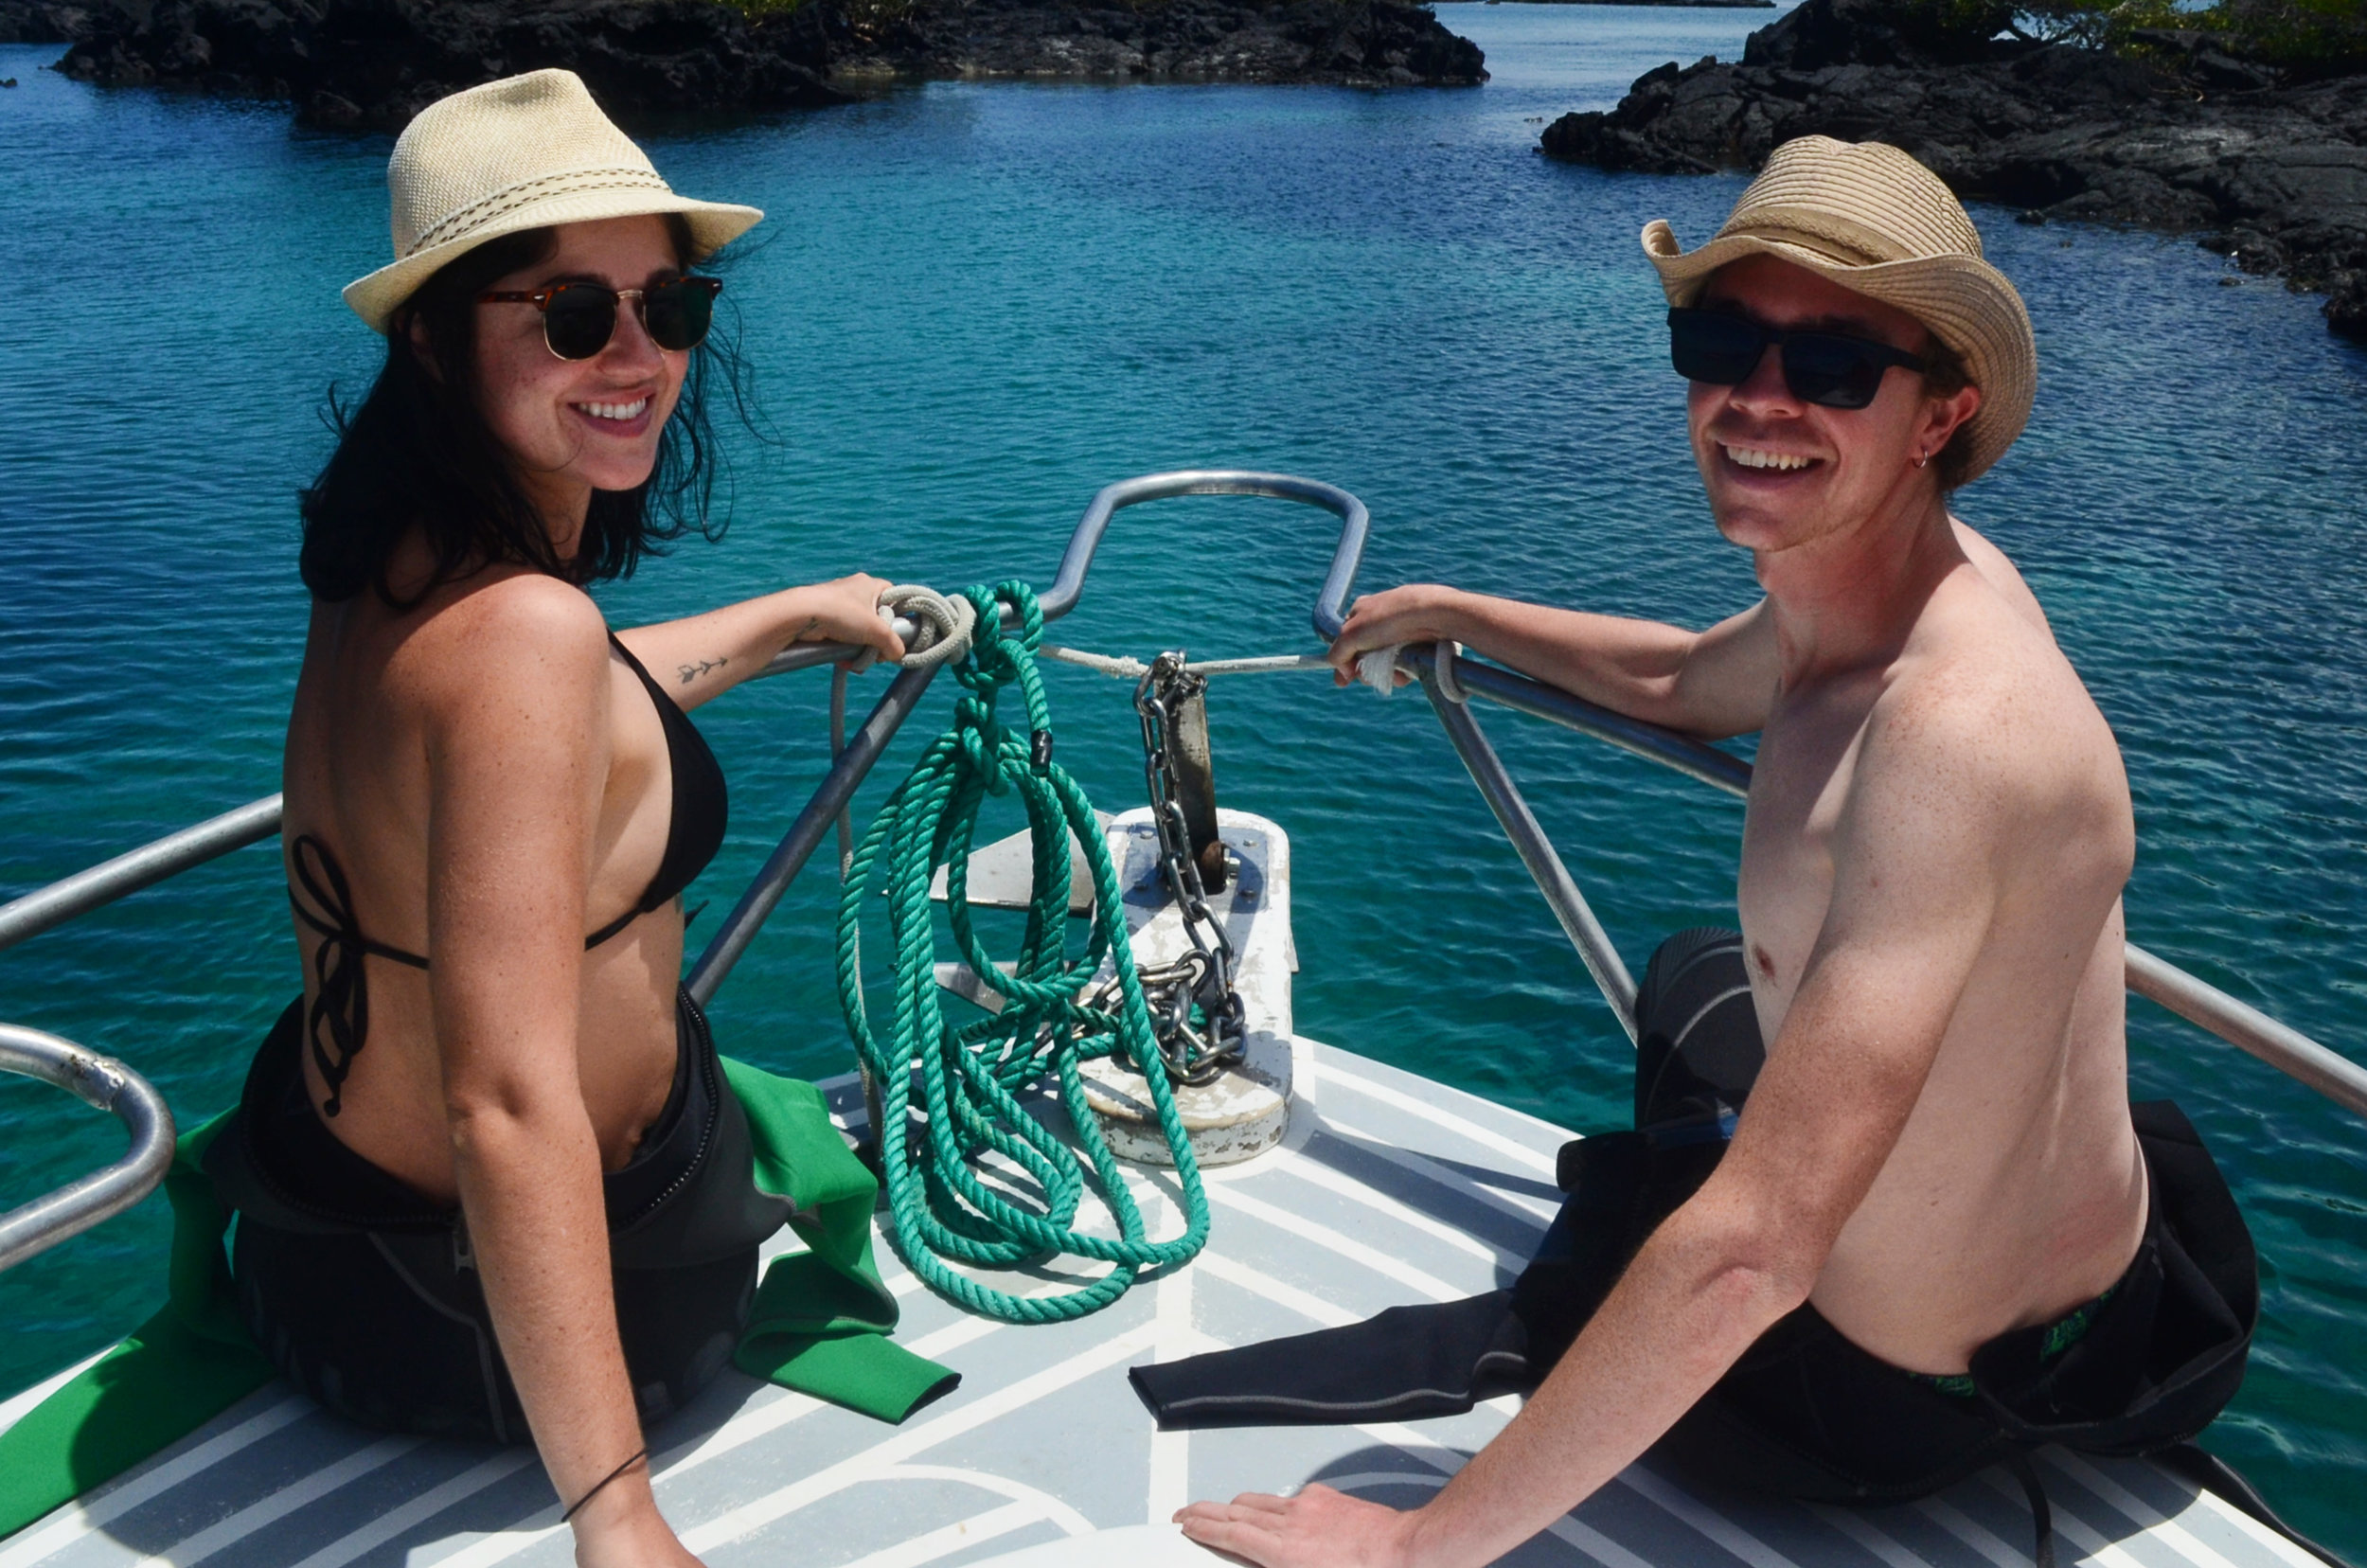 Enjoying the beautiful boat ride to Los Túneles